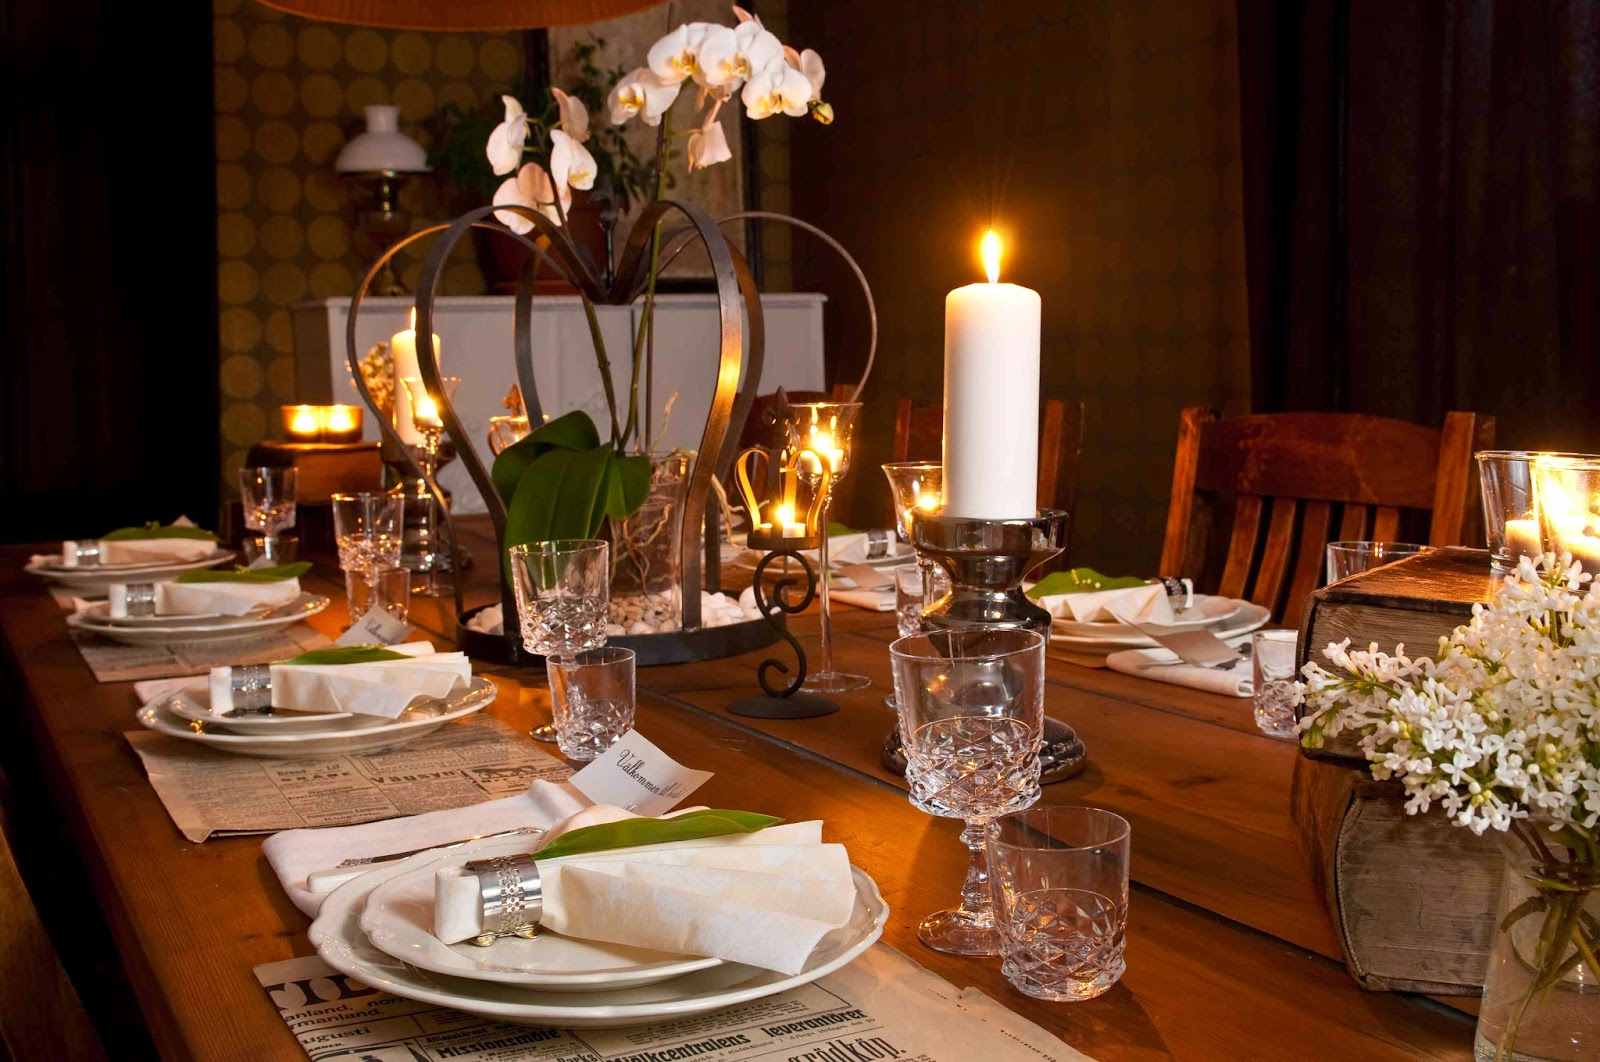 Manners Monday – #DareToBePolite – Dining & Entertaining: Assembling the Elements